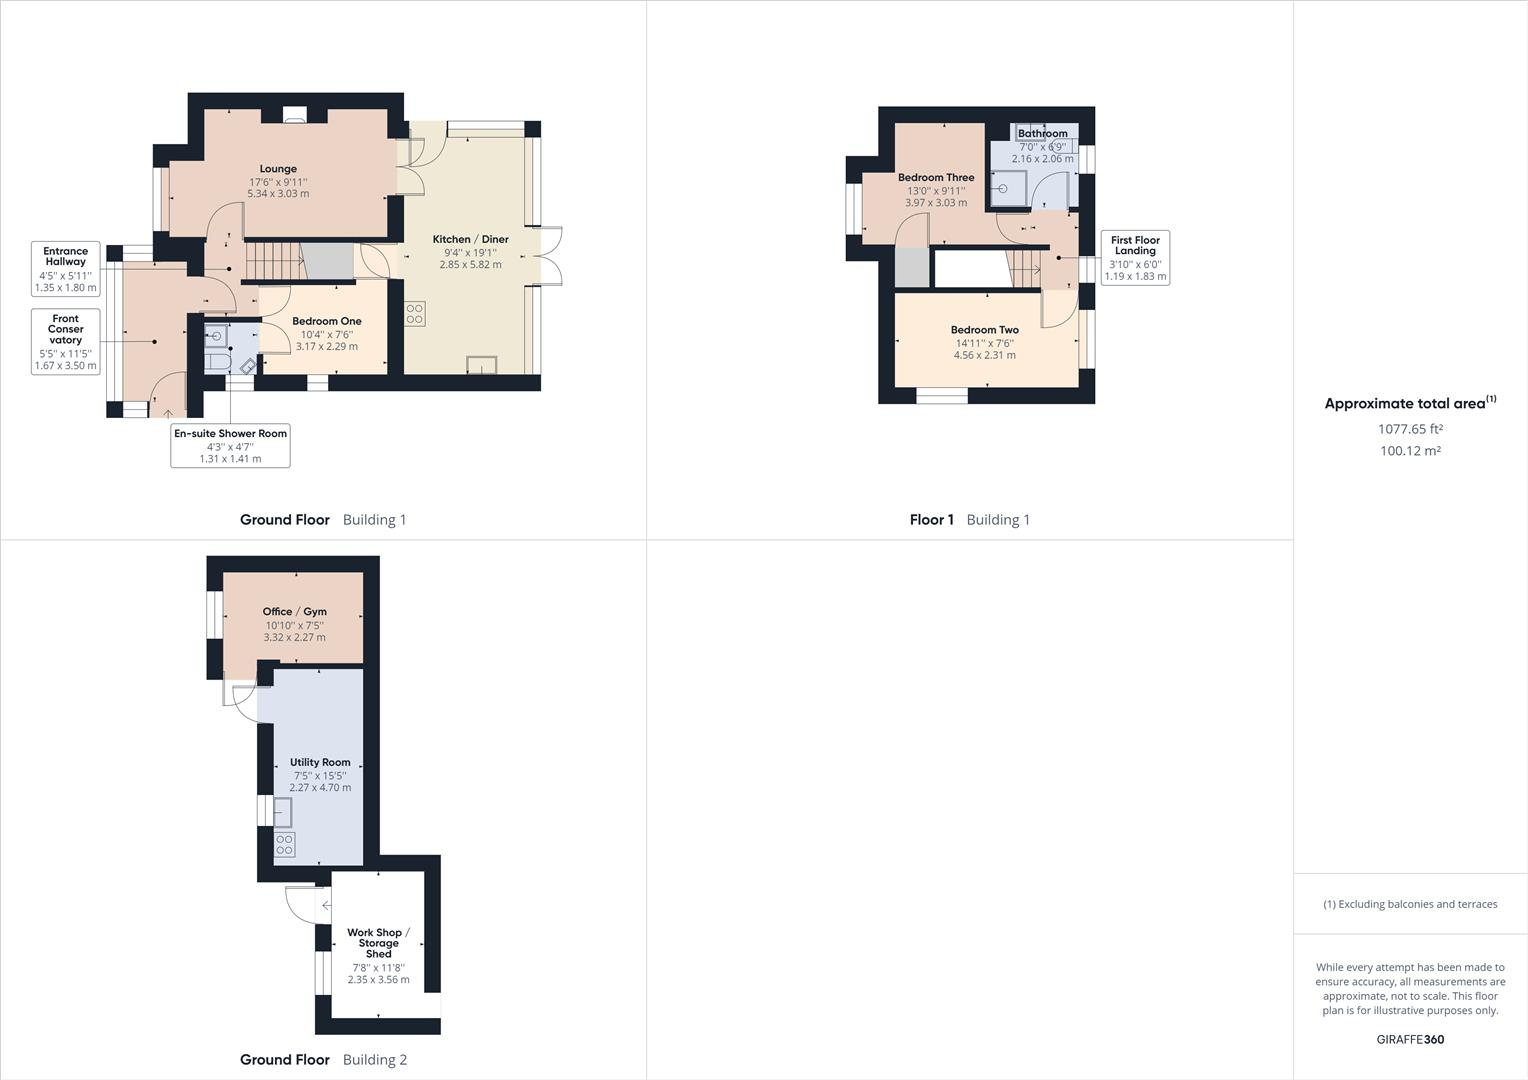 floorplan_ALL.png